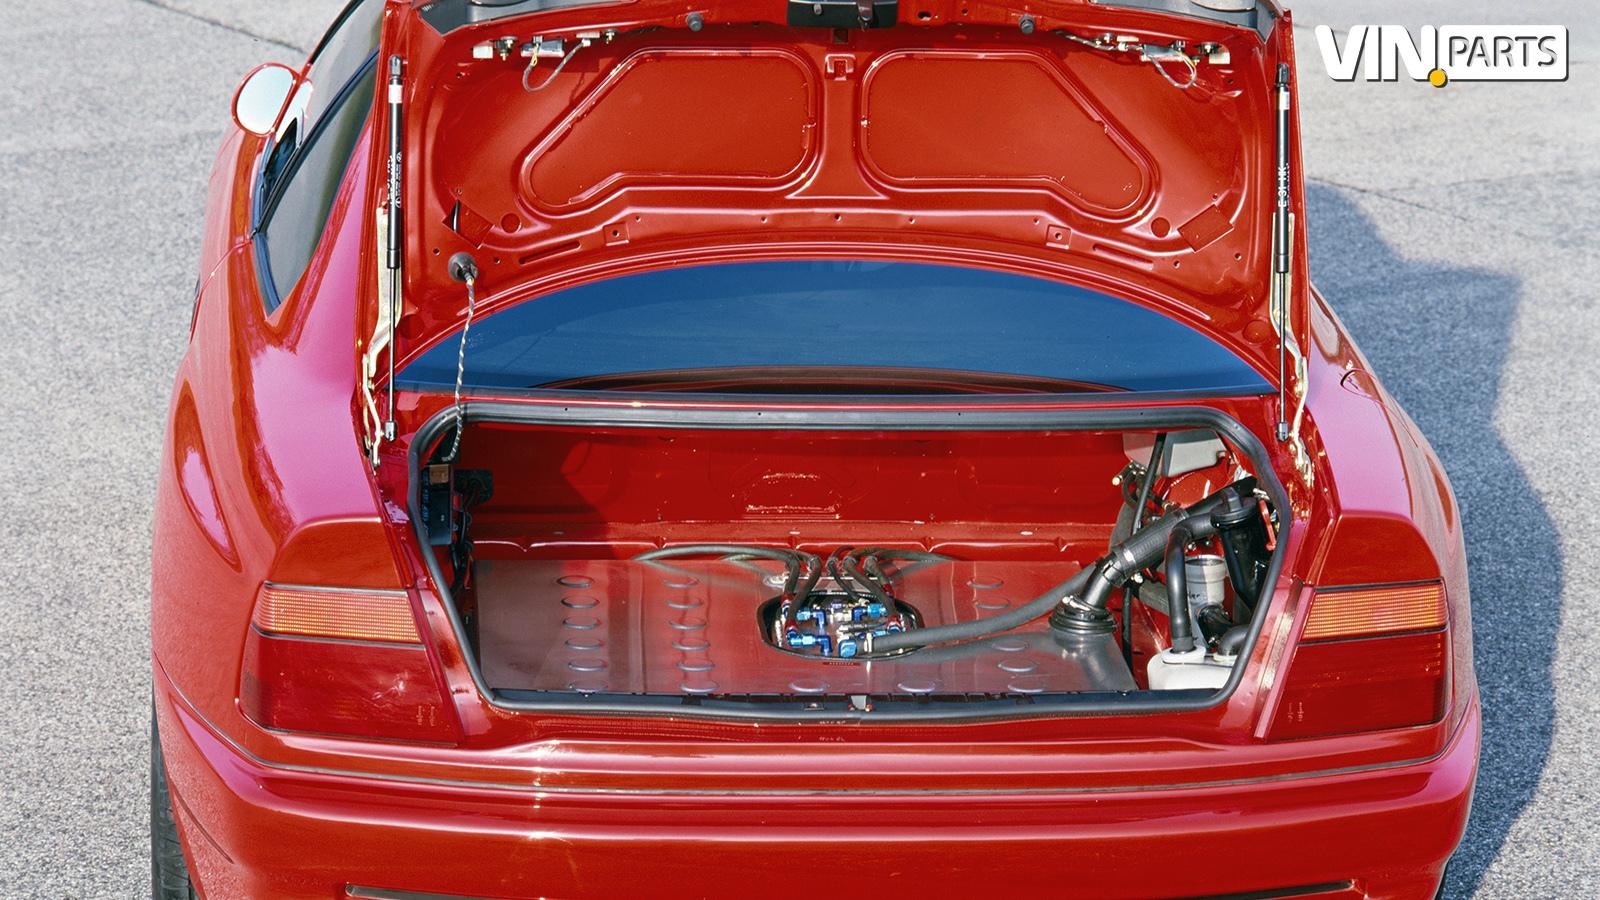 BMW M8 E31 prototype